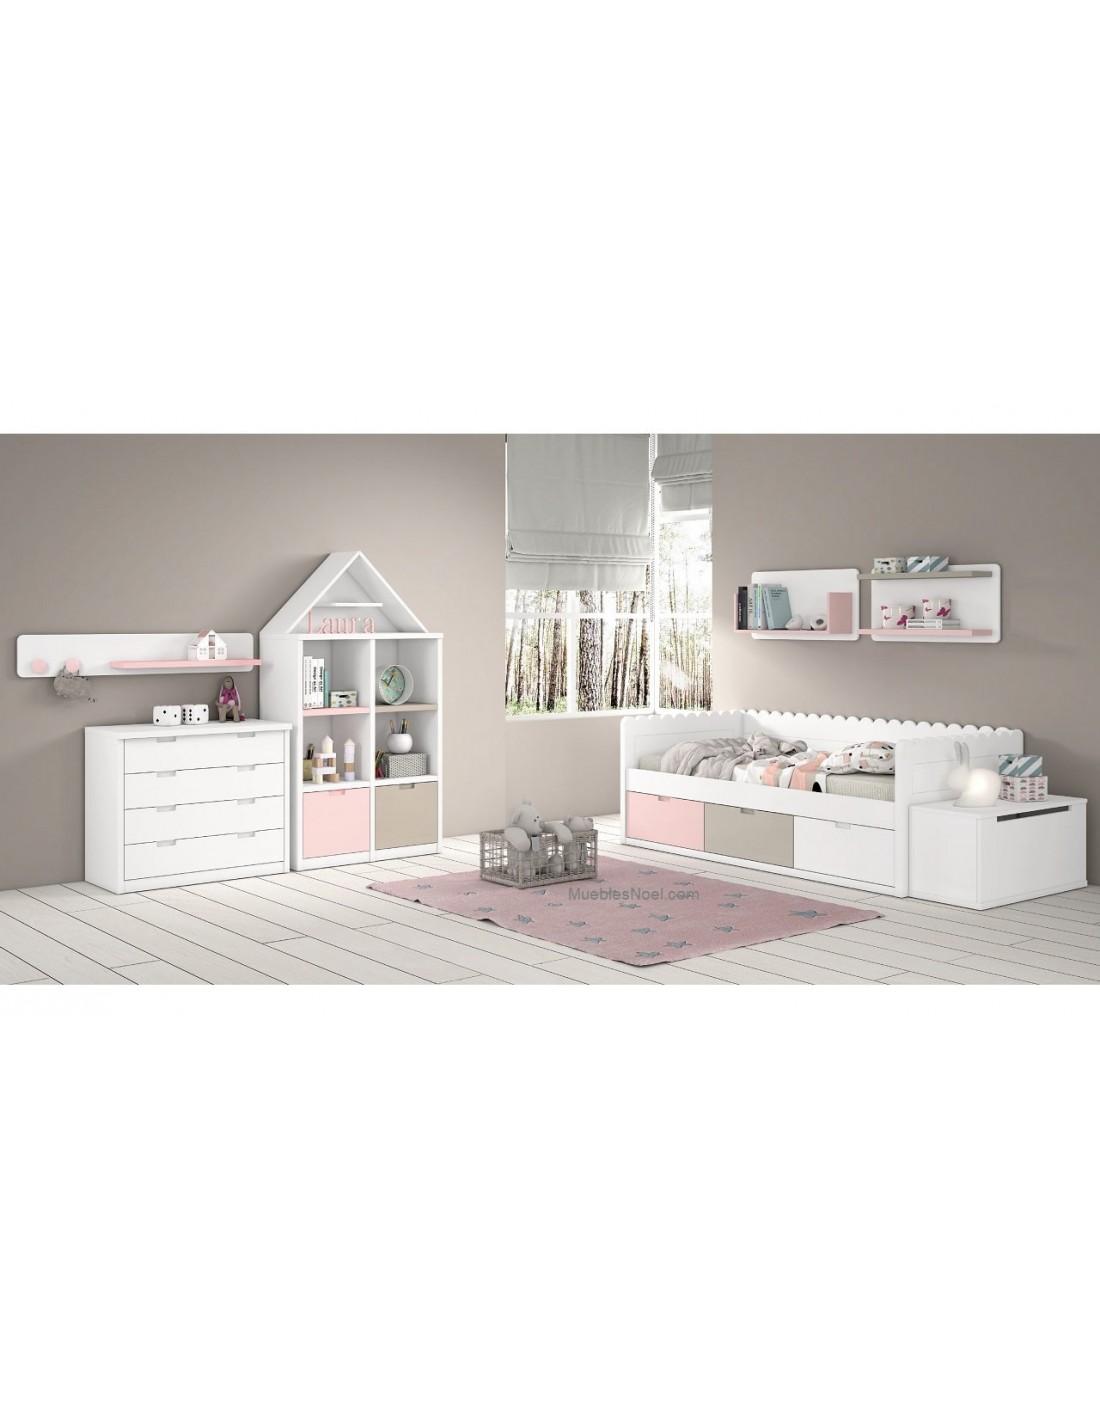 Fabricamos a medida dormitorios infantiles o juveniles - Dormitorios infantiles blancos ...